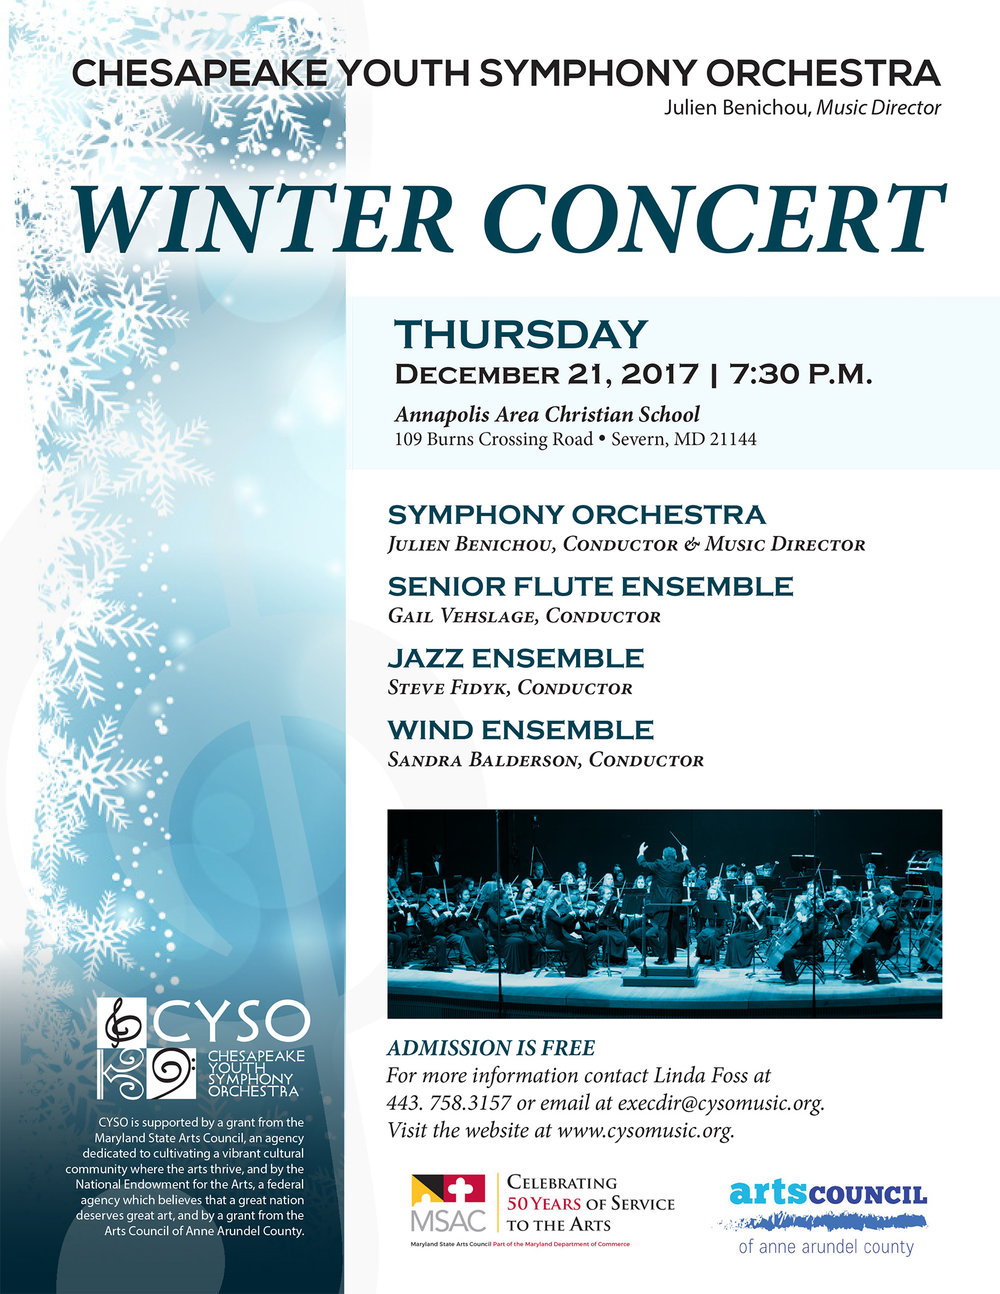 CYSO-Winter-Concert-Flyer_update.jpg